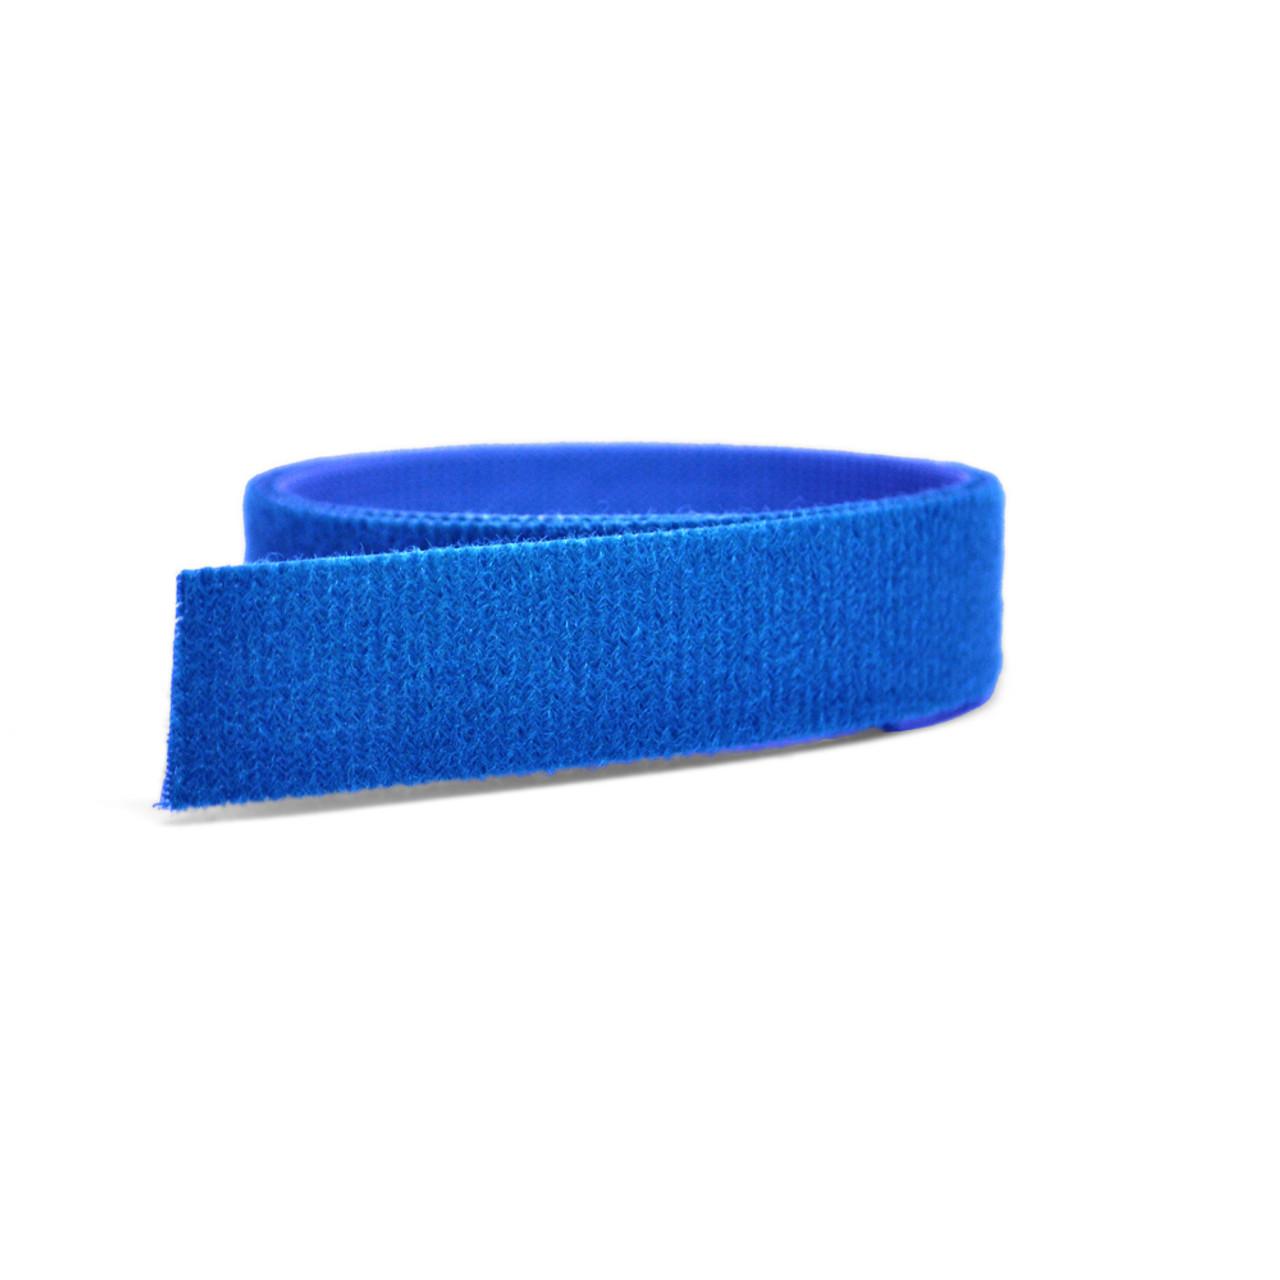 VELCRO® Brand ONE-WRAP® Tape Blue Mini Rolls / Velcro Straps - Bundling Straps - Velcro Tie - Velcro Strap